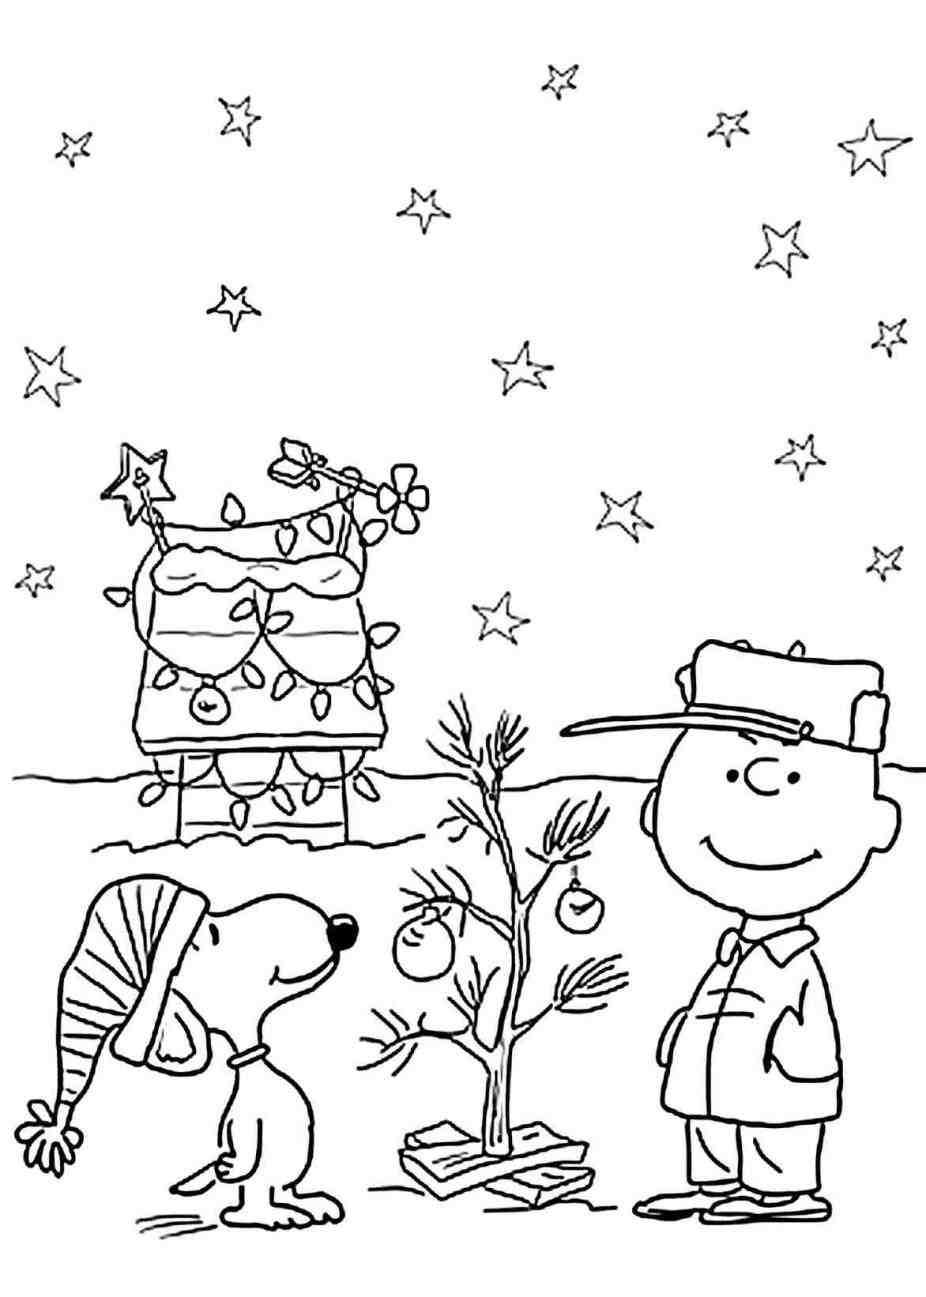 926x1297 Simple Christmas Drawings Ideas